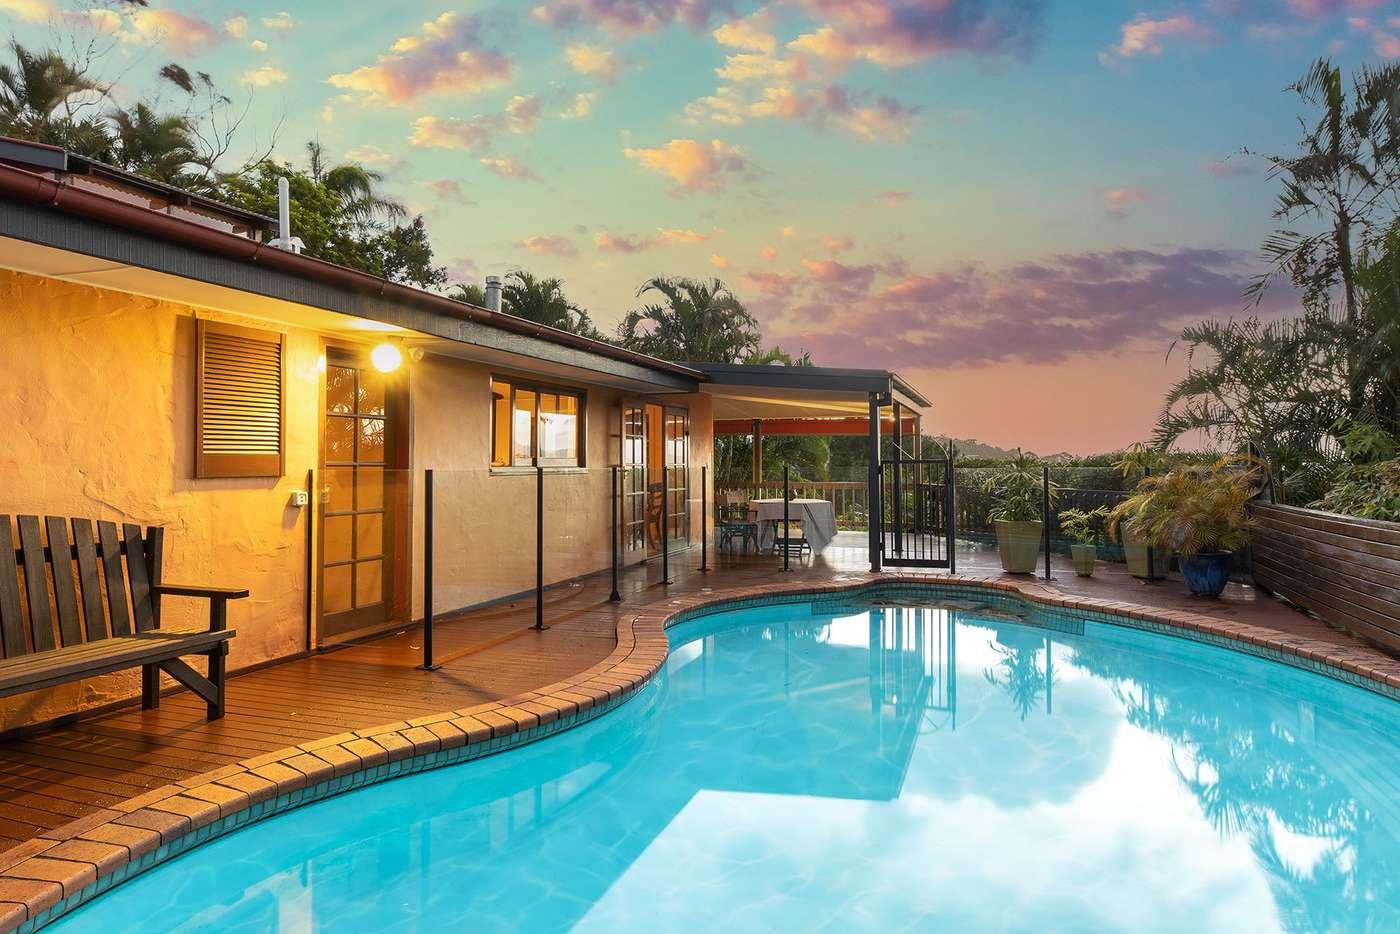 Main view of Homely house listing, 6 Kara Court, Yaroomba QLD 4573